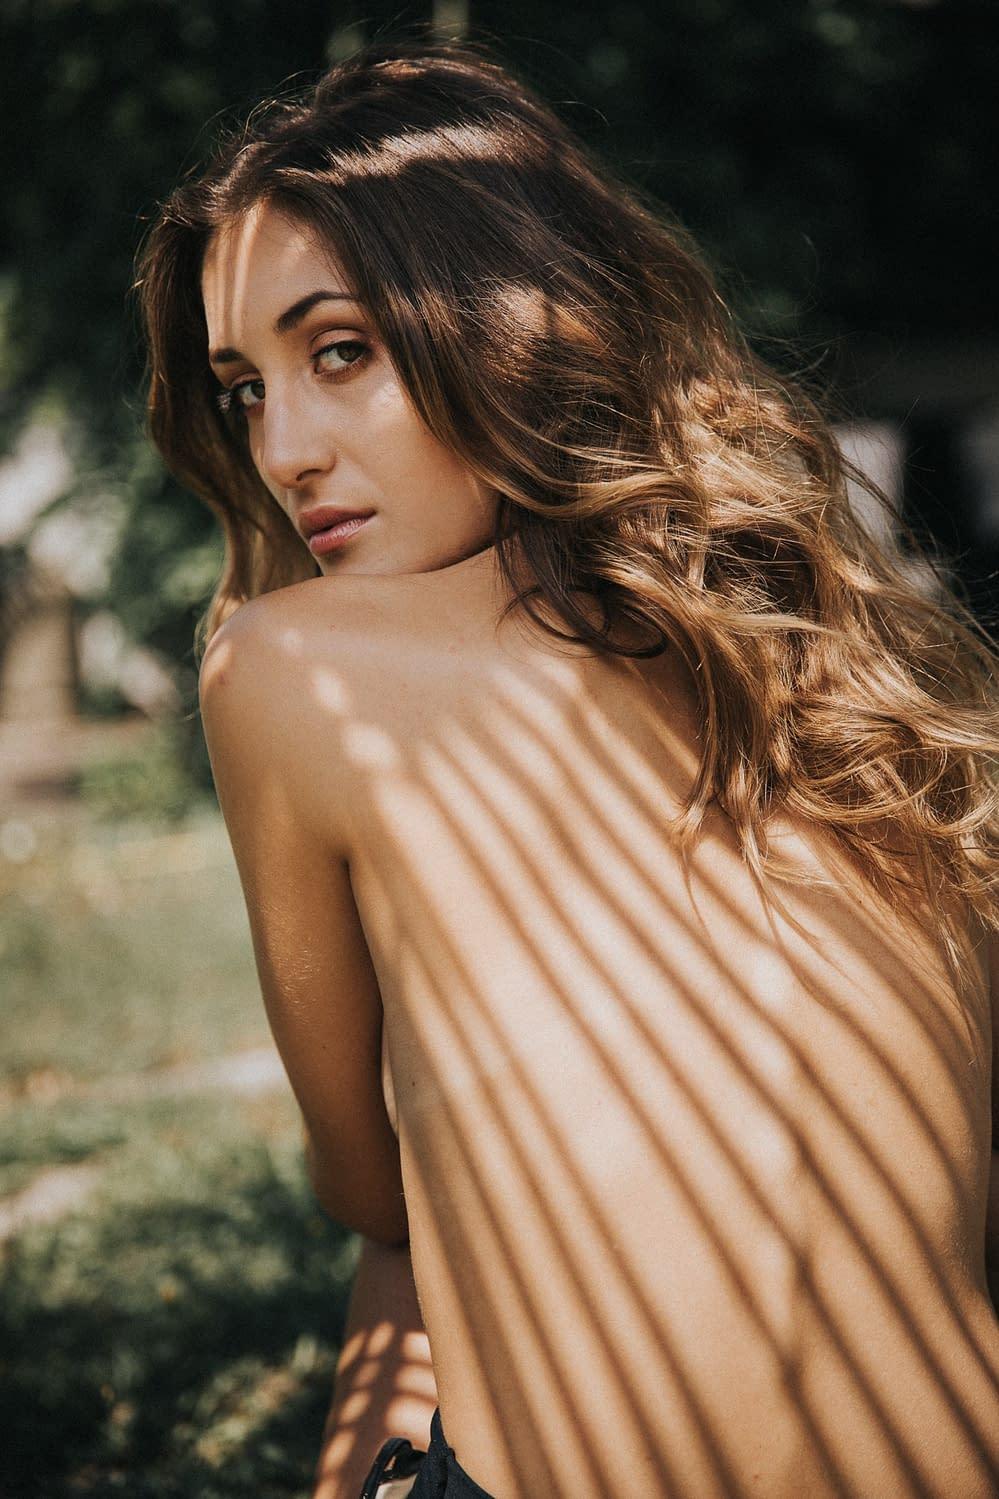 summer Portrait Nicole - Model Test